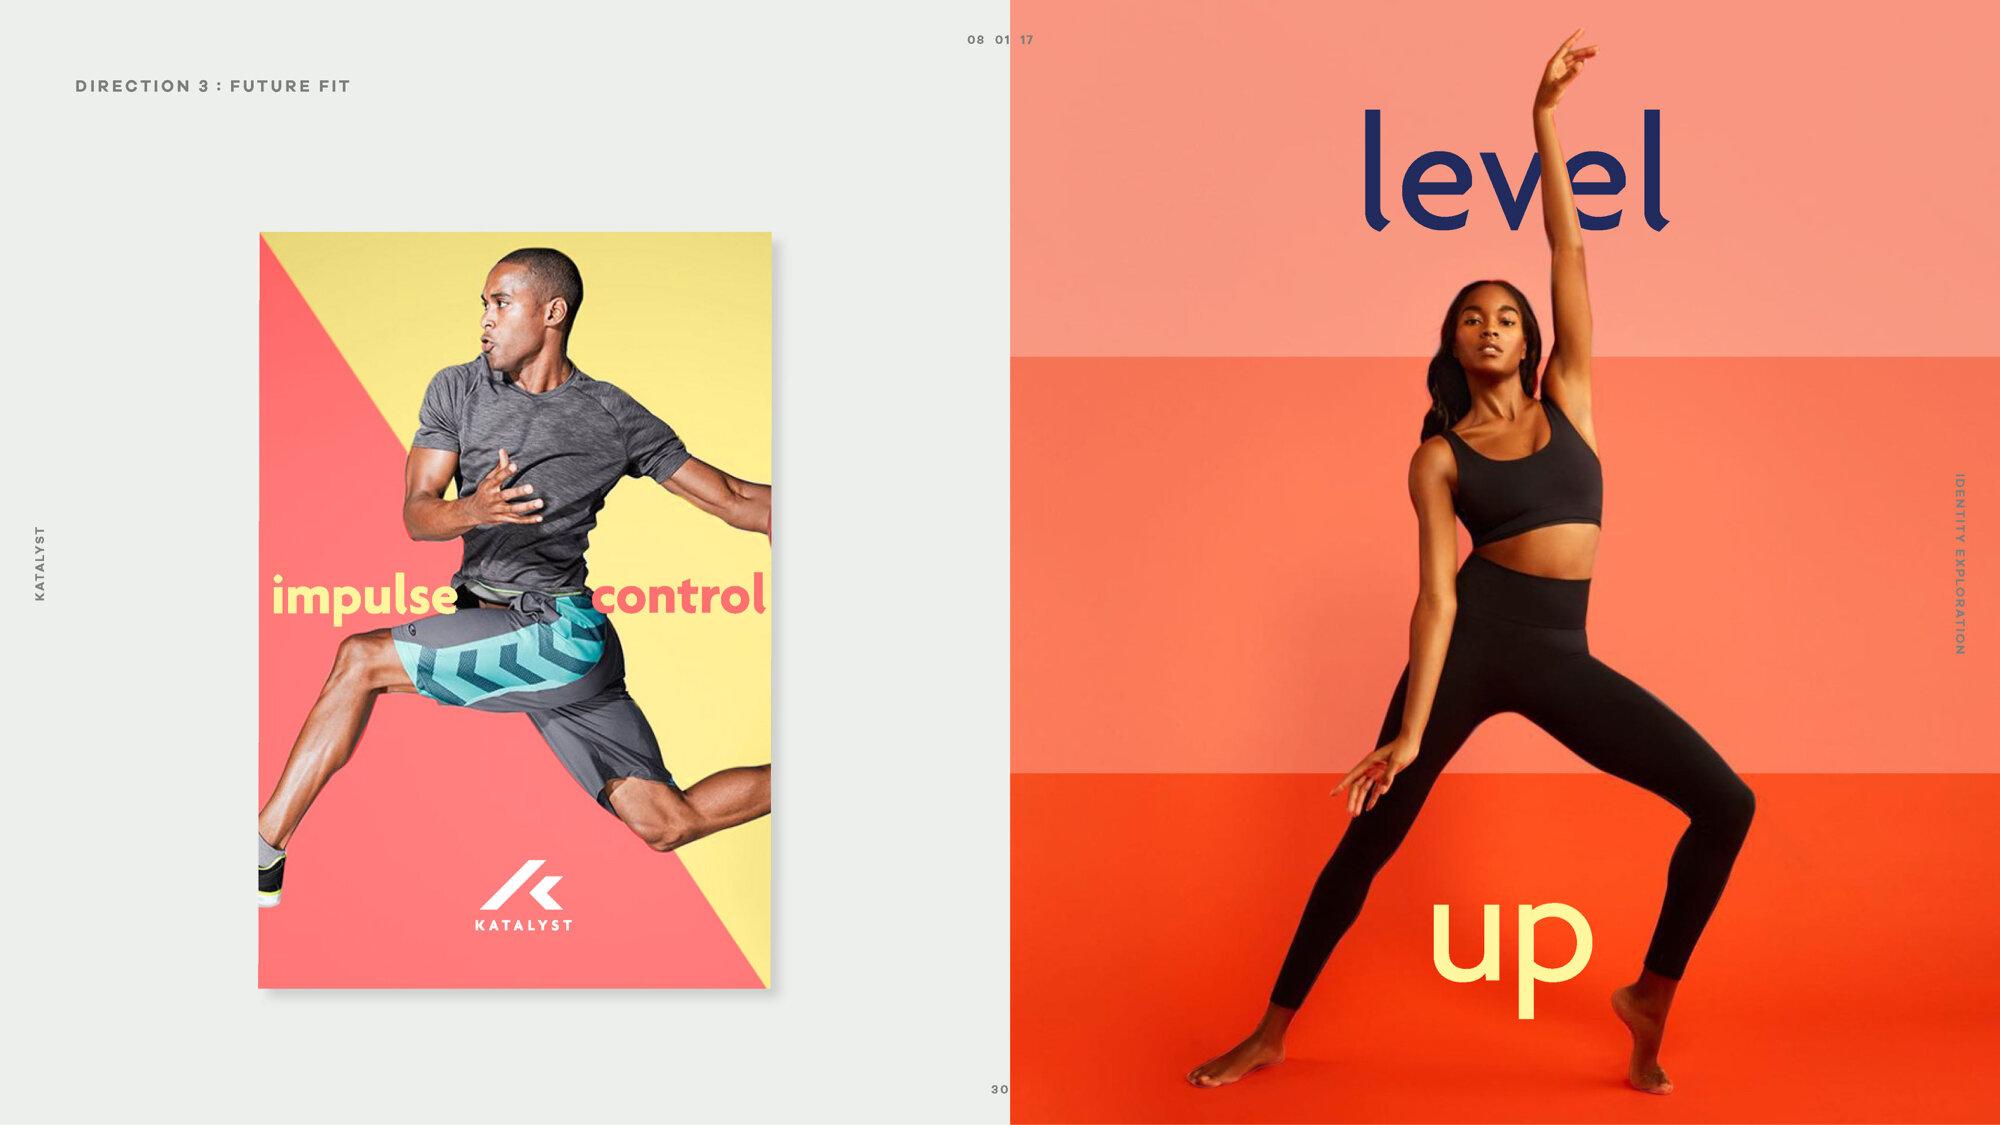 20170731_StudioMega_Katalyst_Brand_Design_Directions_PH1R2_Page_06.jpg